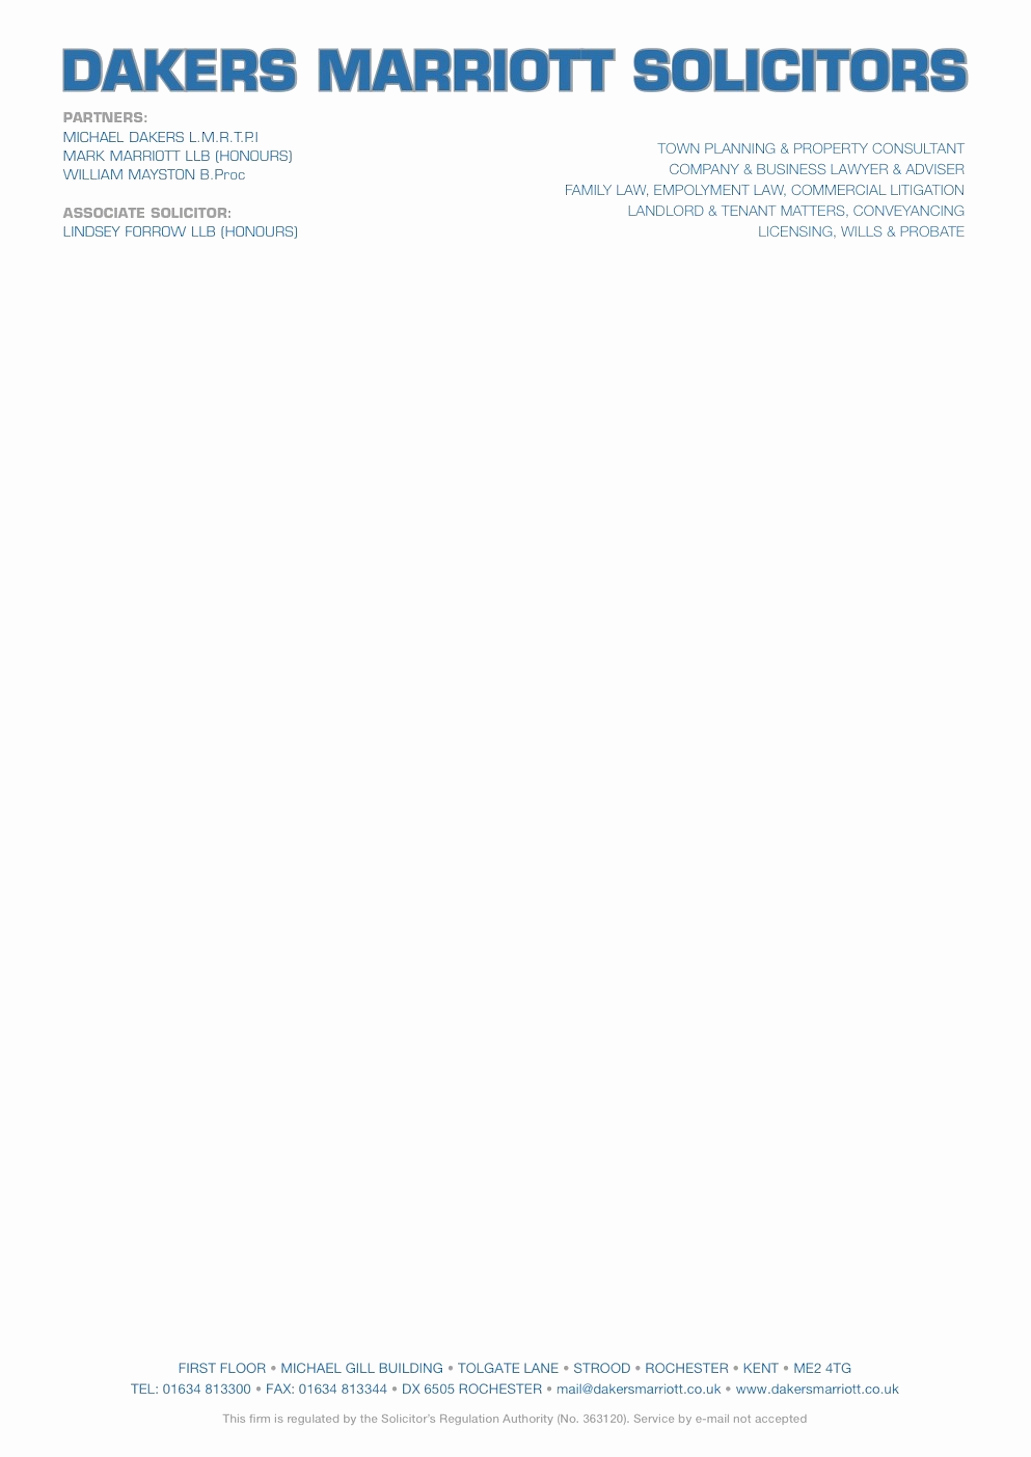 Company Letterhead Template Word Luxury 17 Pany Letterhead Templates Excel Pdf formats